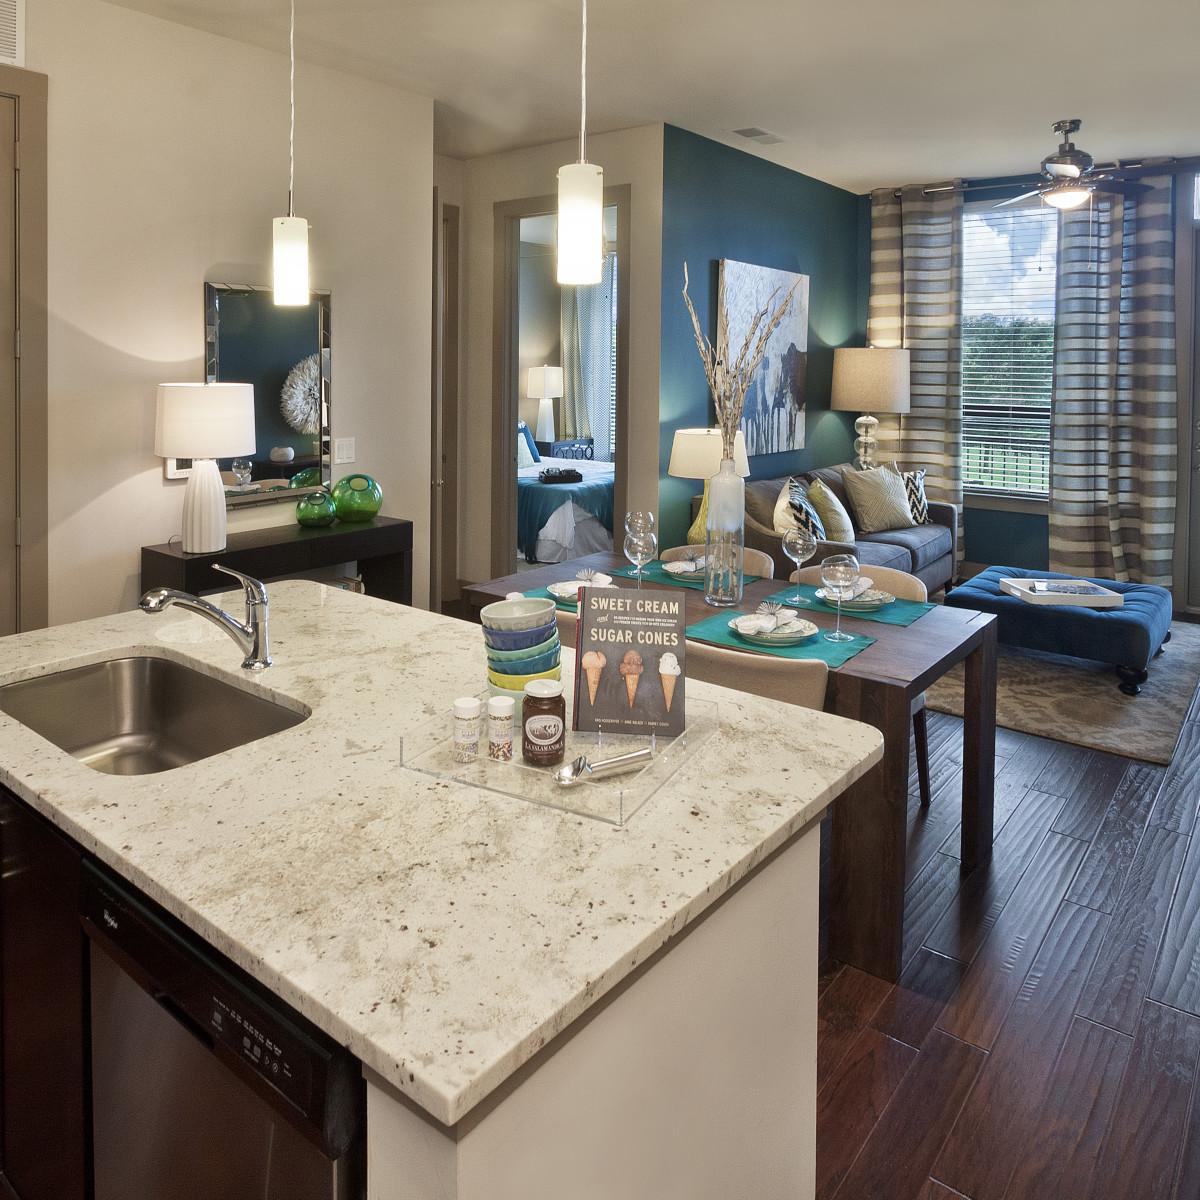 Echo apartments in Austin